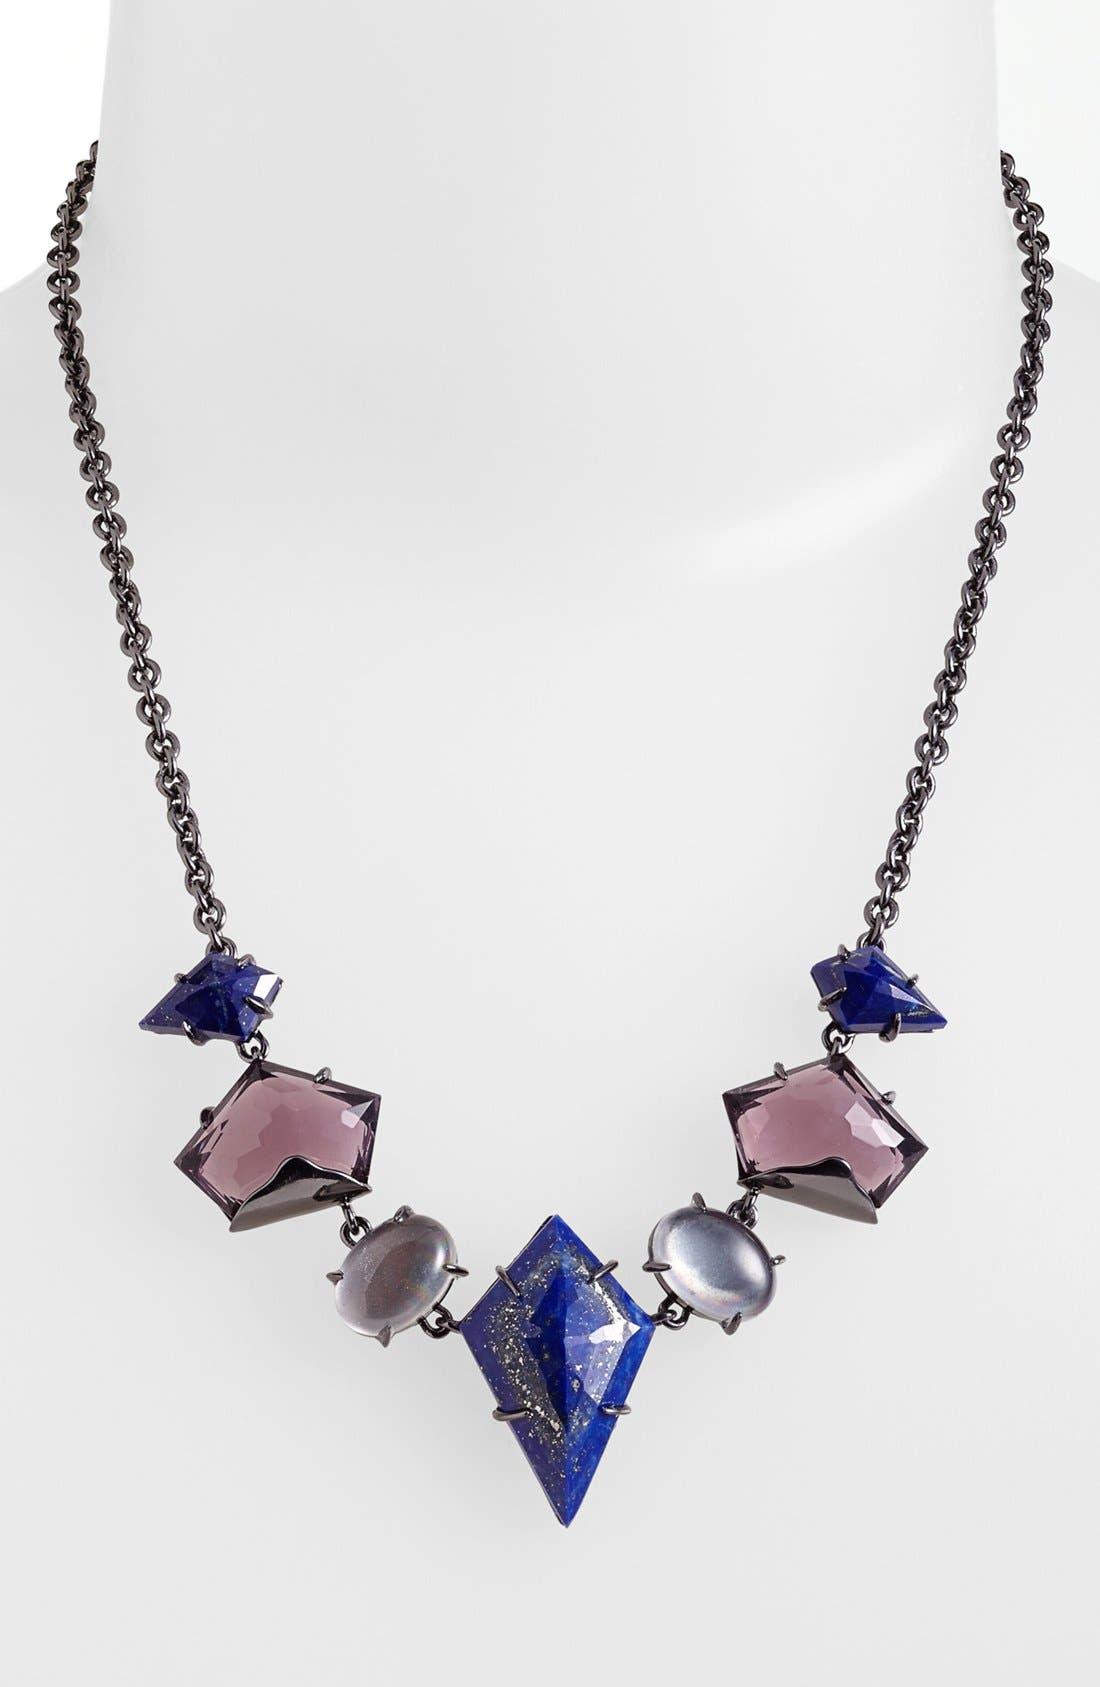 Alternate Image 1 Selected - Alexis Bittar 'Miss Havisham' Frontal Necklace